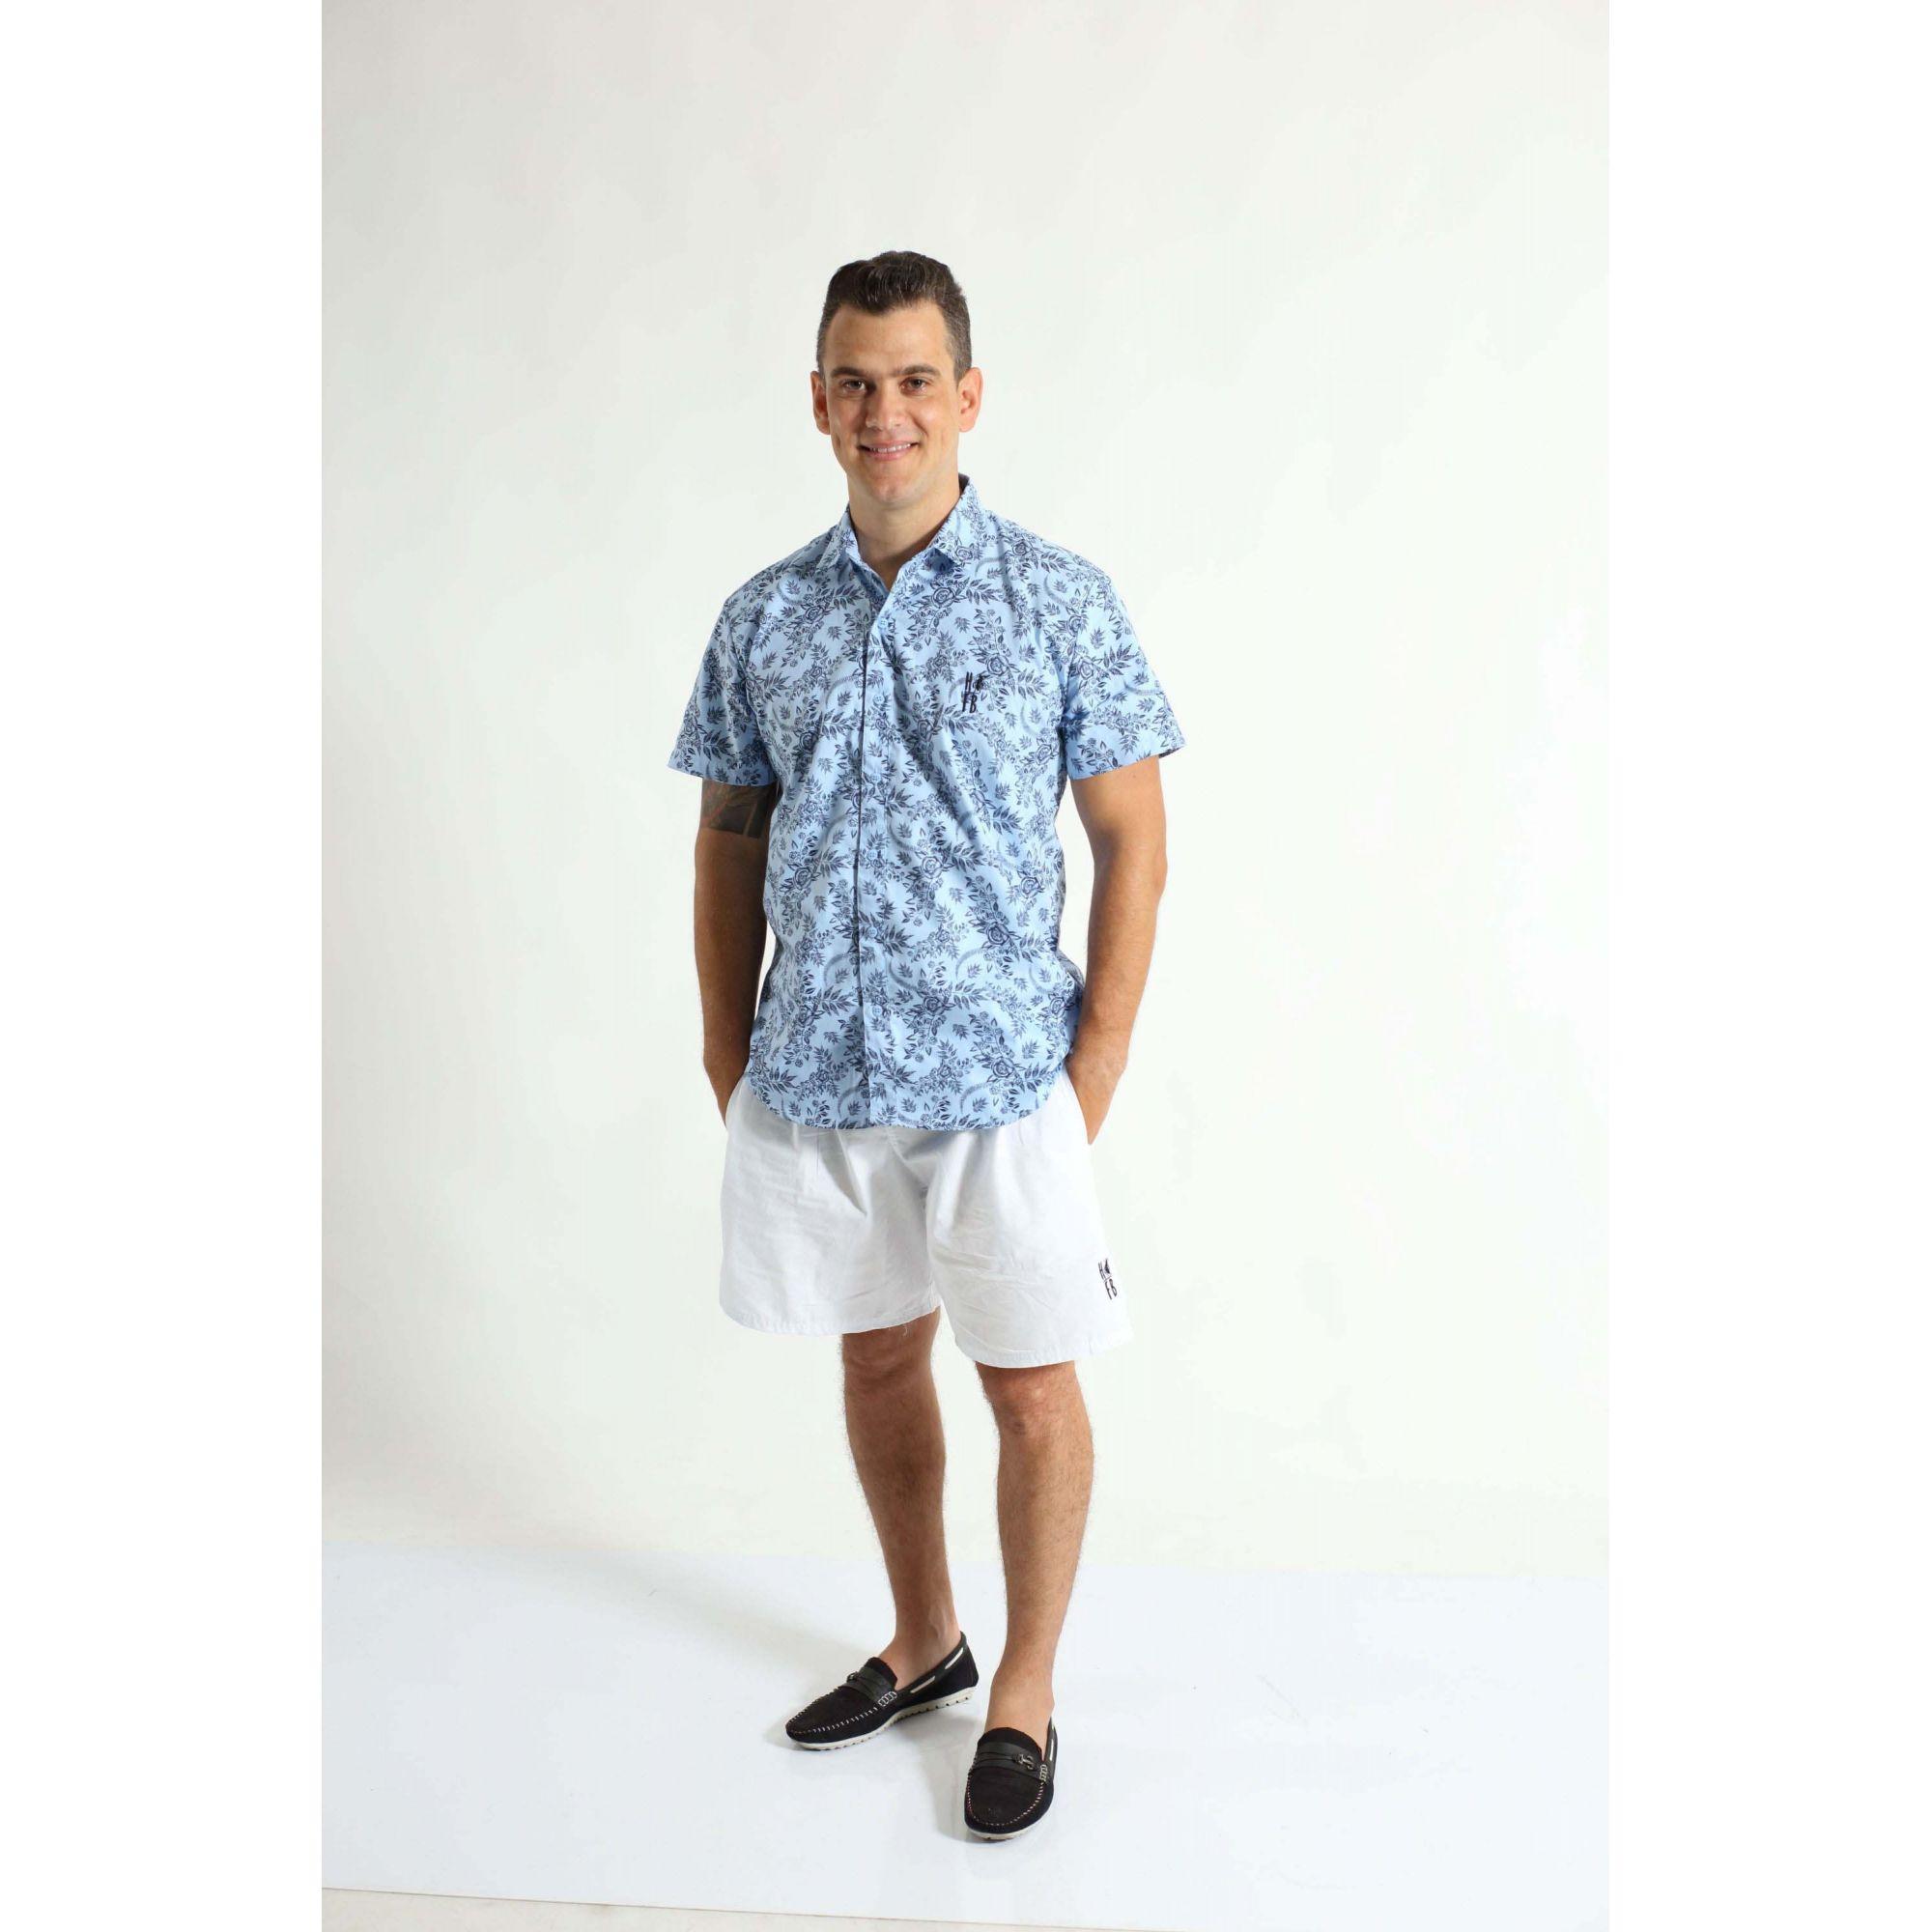 Camisa Social Manga Curta Azul Floral Adulta  - Heitor Fashion Brazil